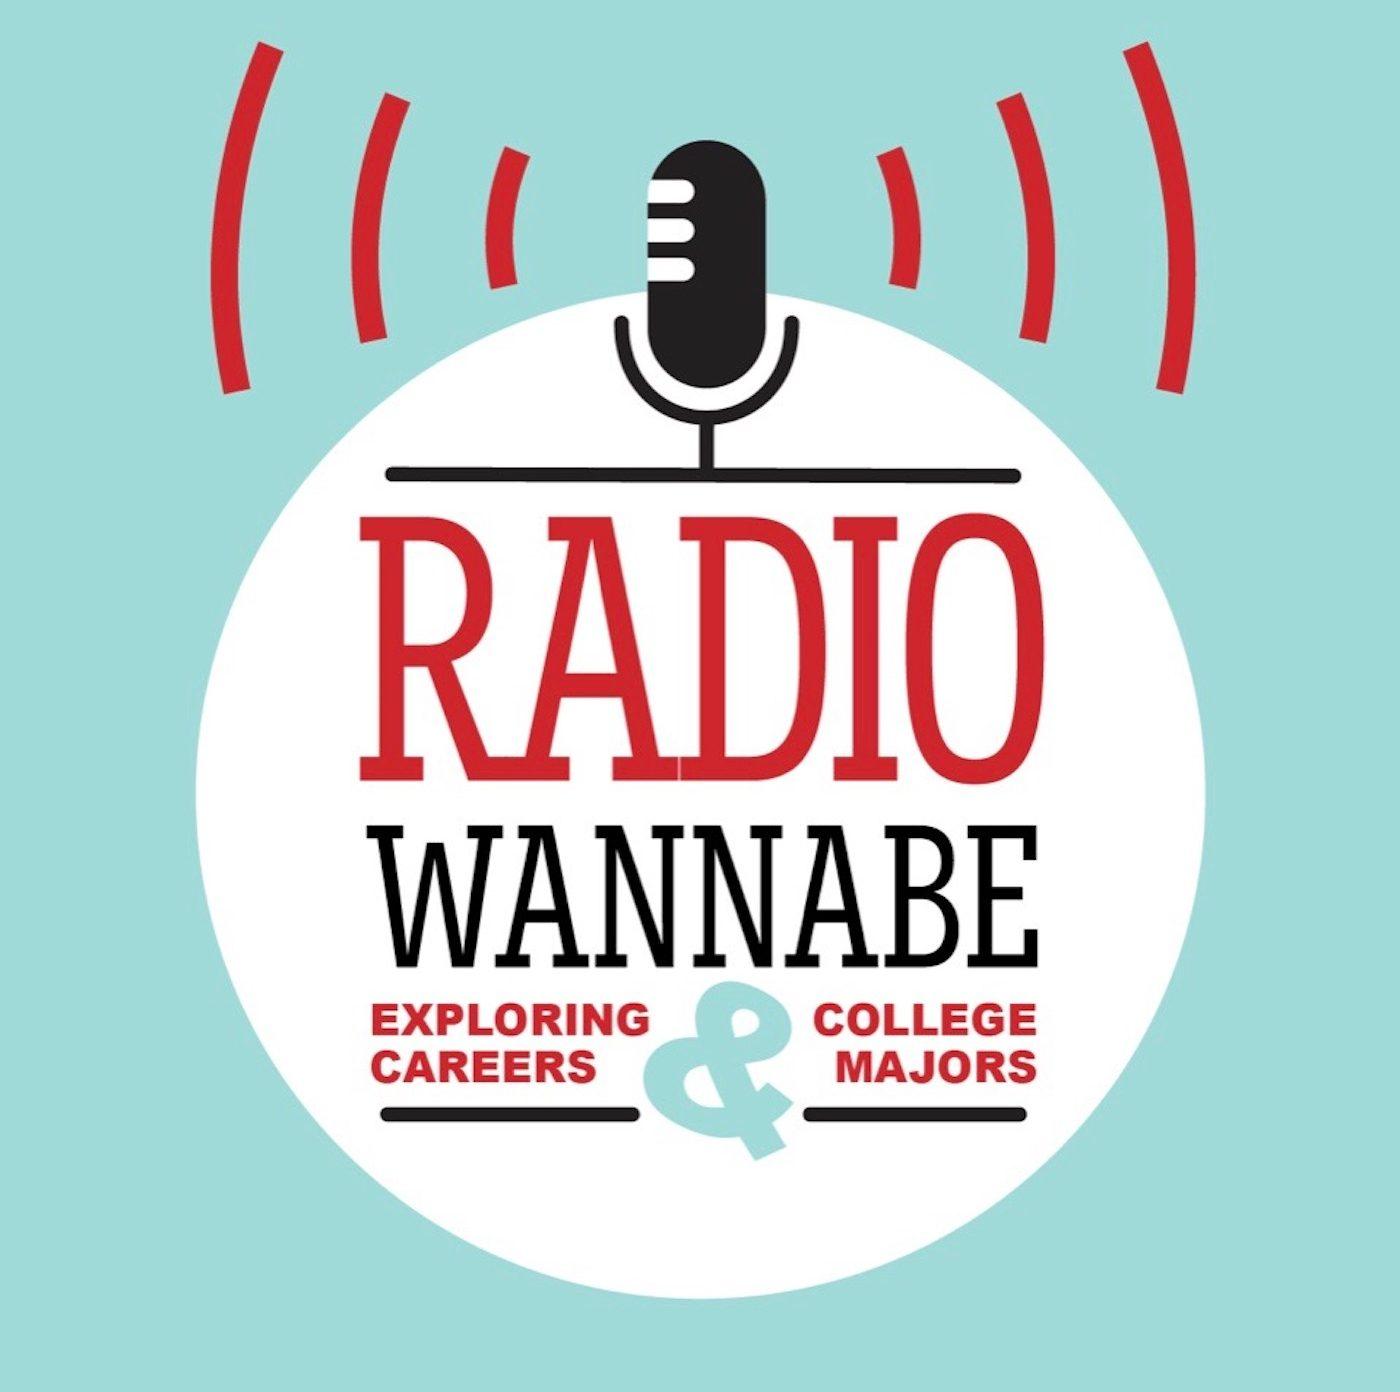 RadioWannabe.com